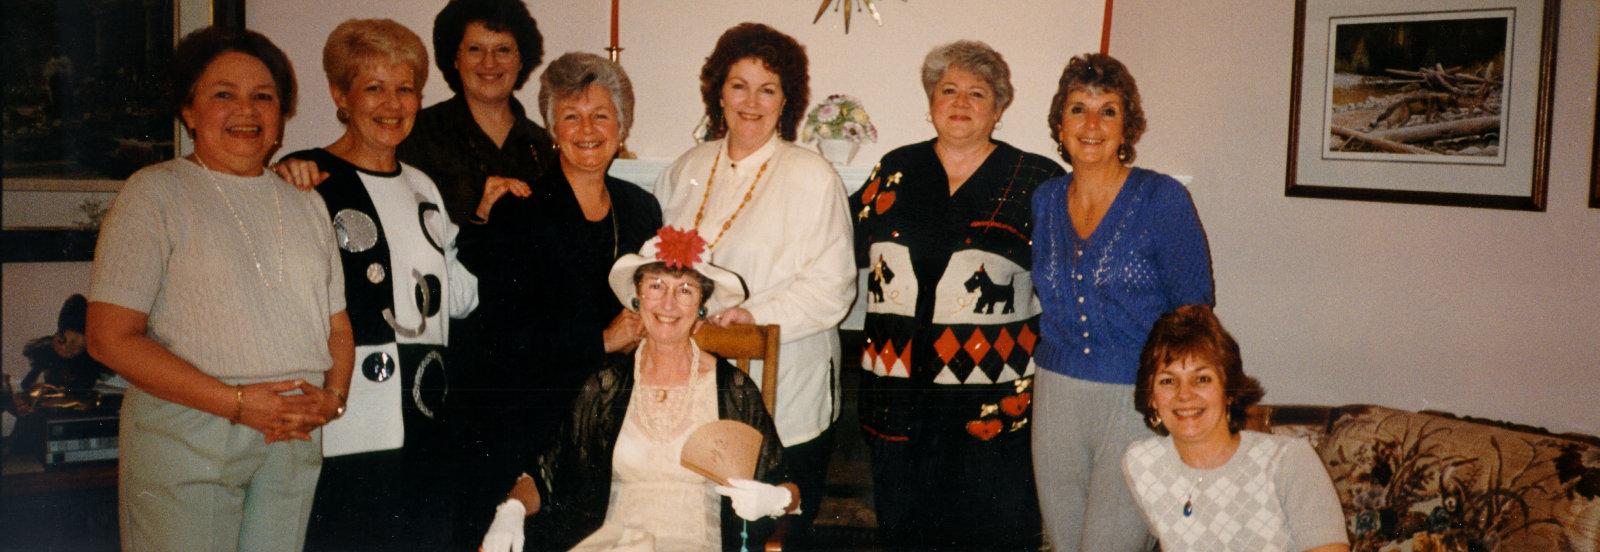 1996l